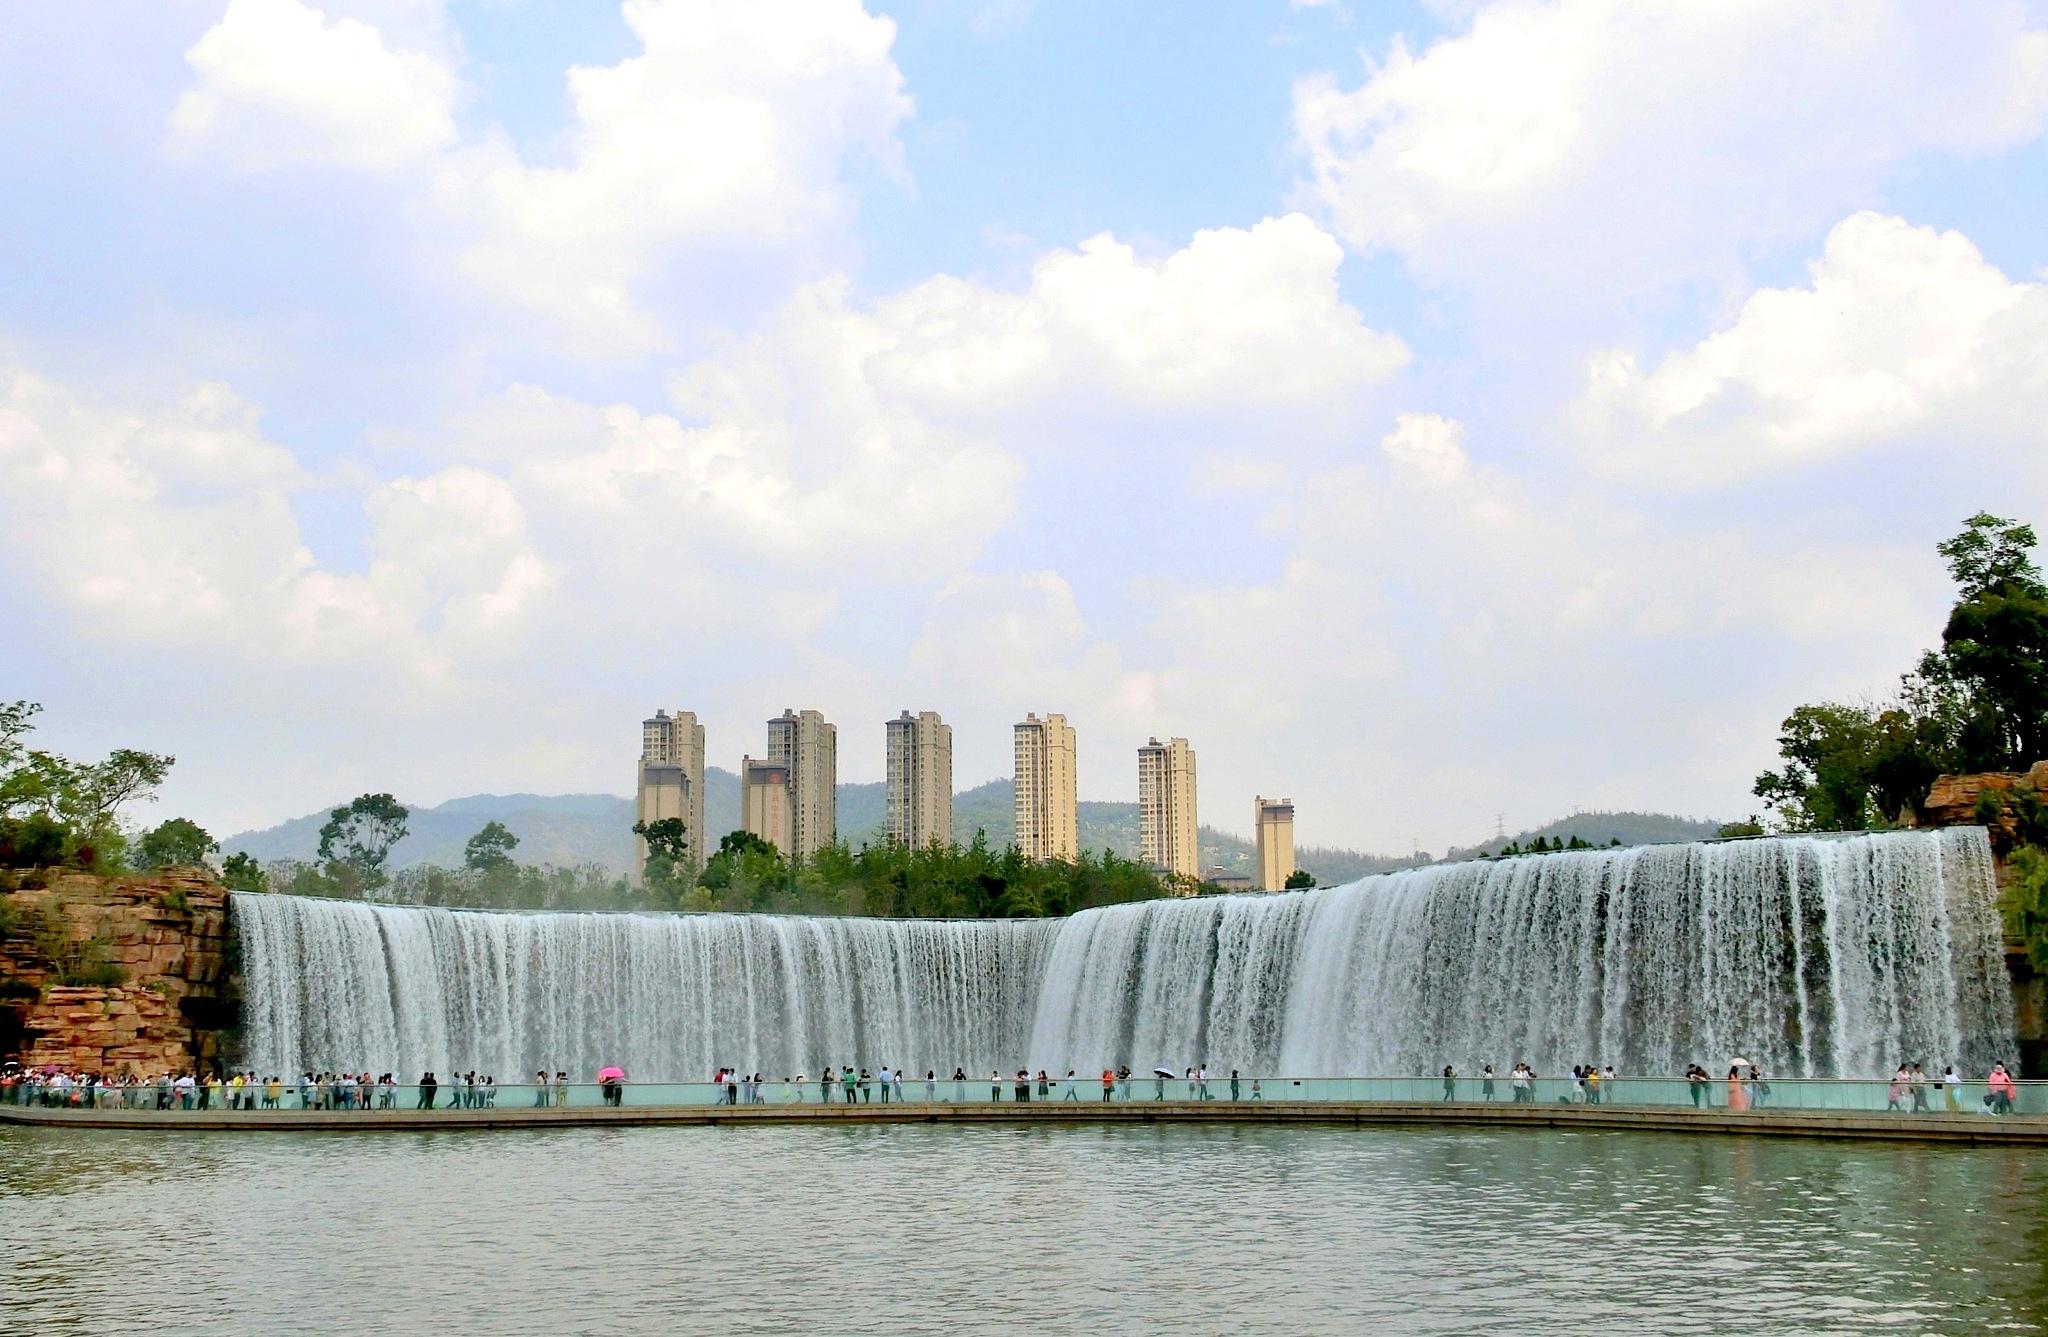 Kunming Waterfall Garden-1 by pop88123